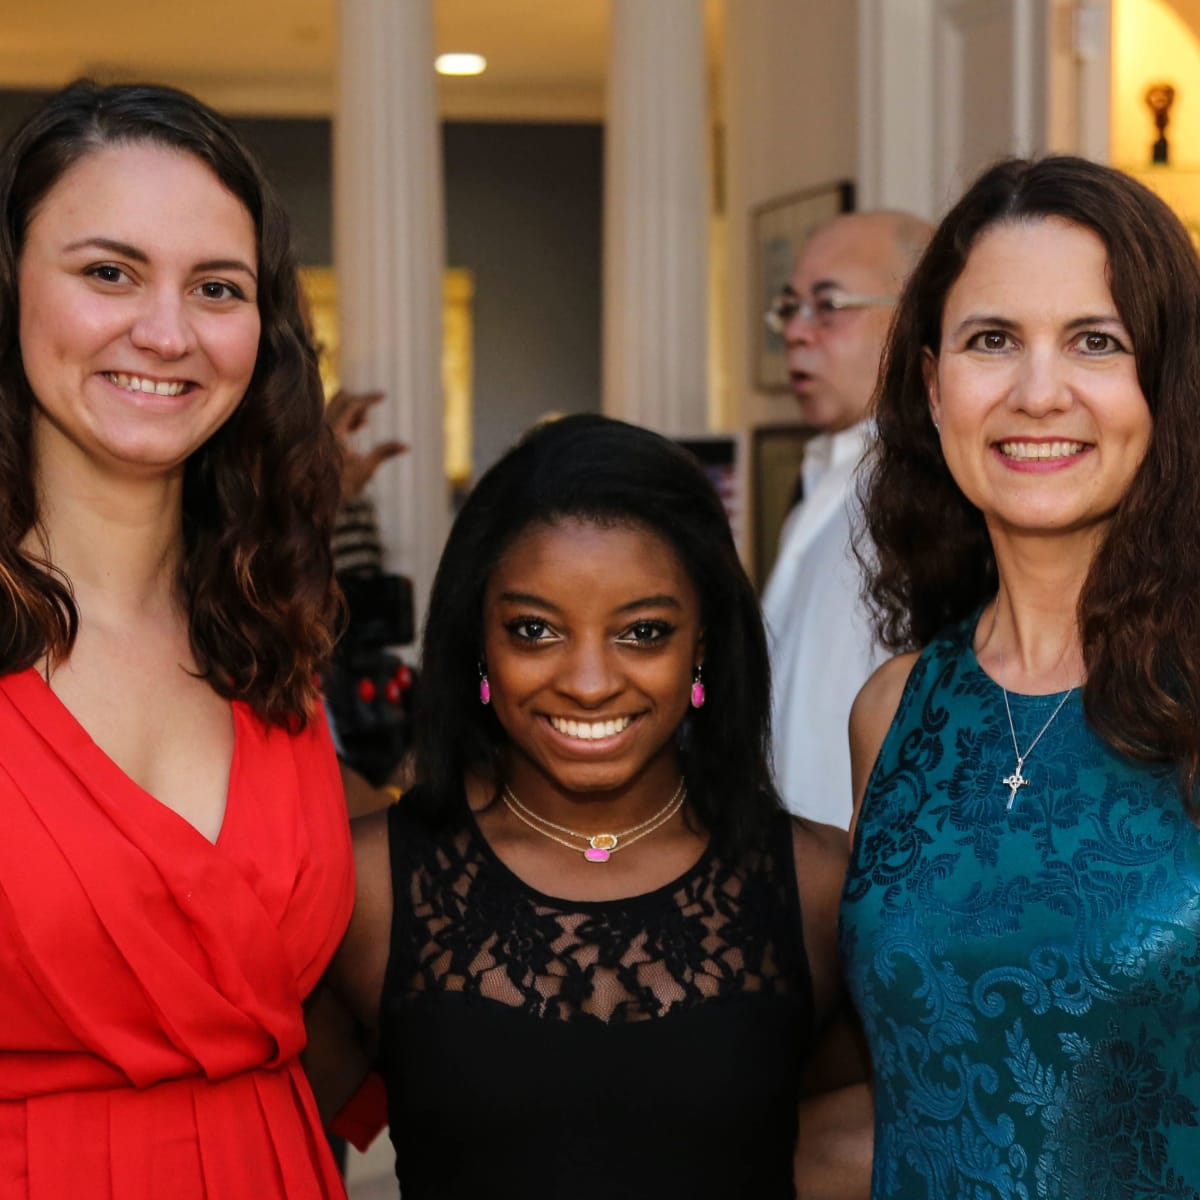 News, Shelby, Simone Biles reception, Nov. 2015, Raquel Riddle, Simone Biles, Andrea Riddle